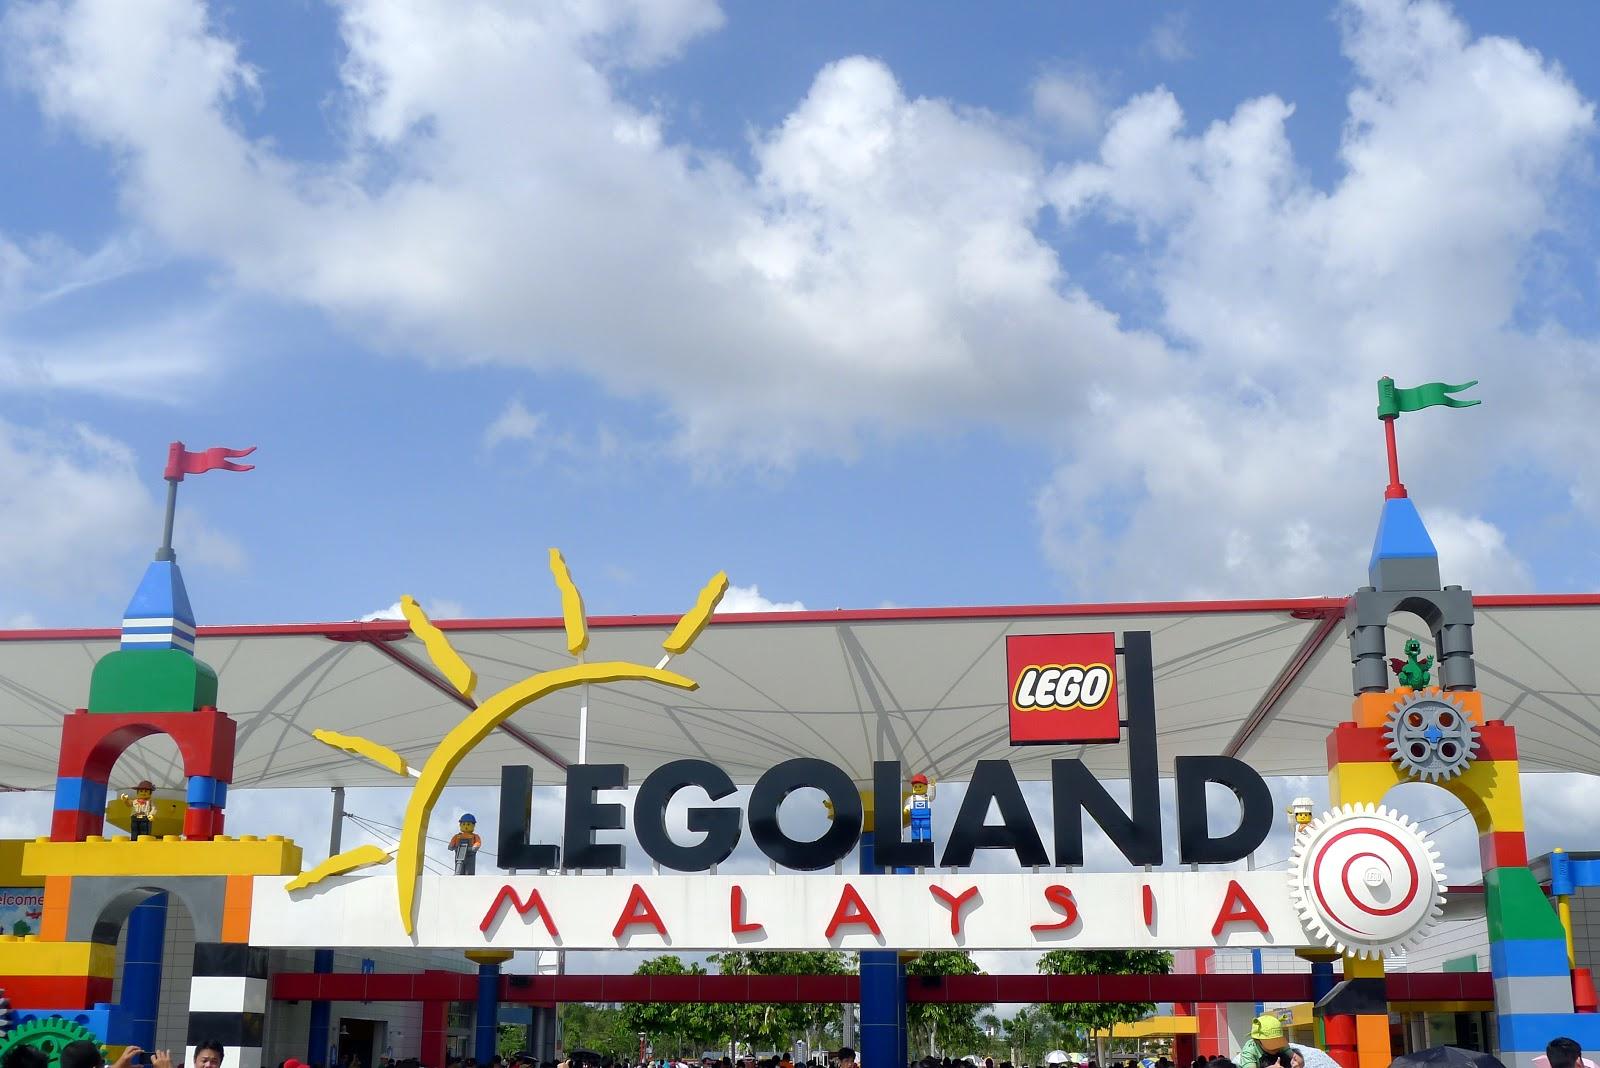 my greatest opponent: Legoland Malaysia